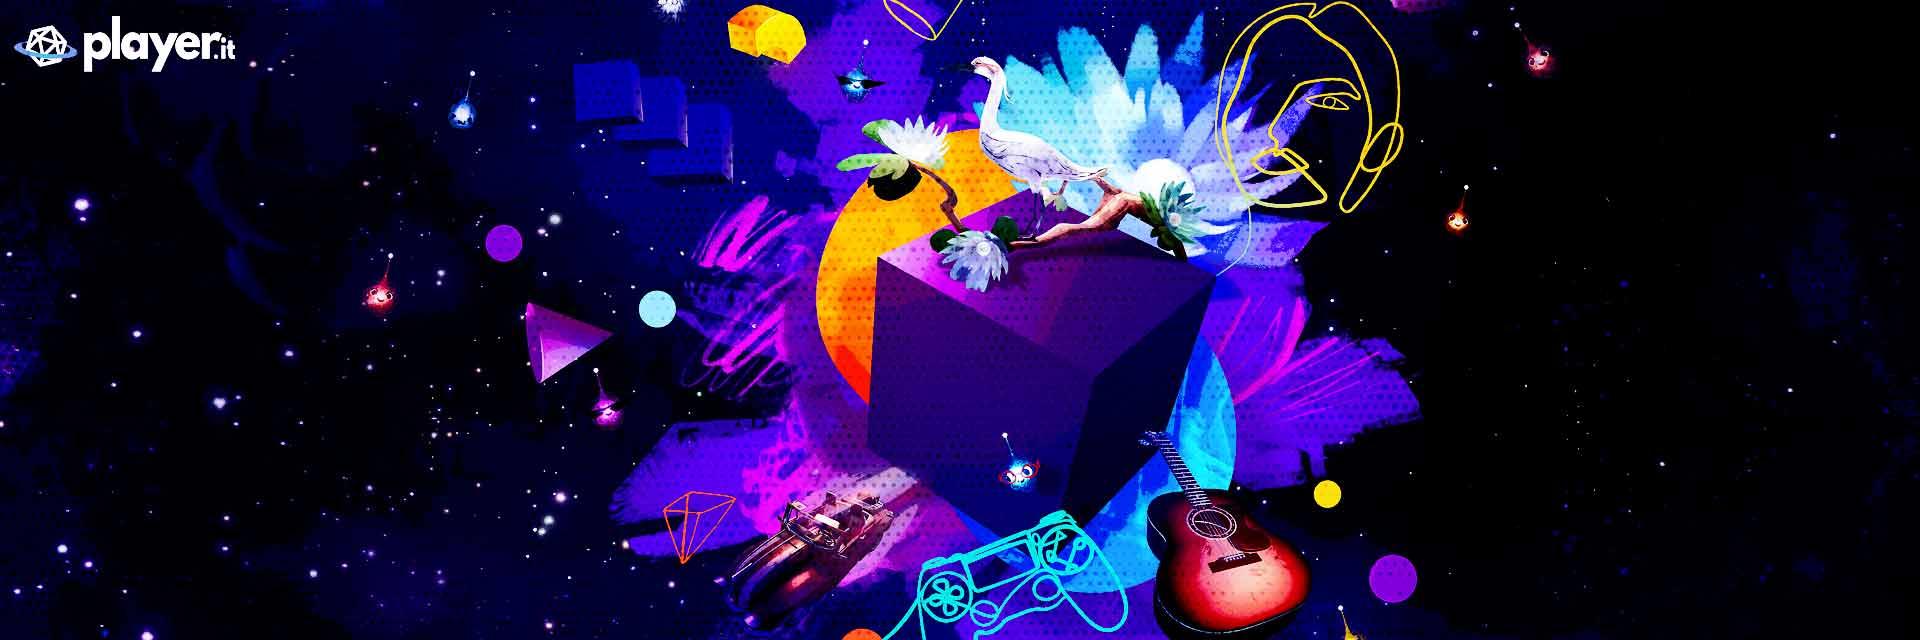 dreams PS4 wallpaper in HD